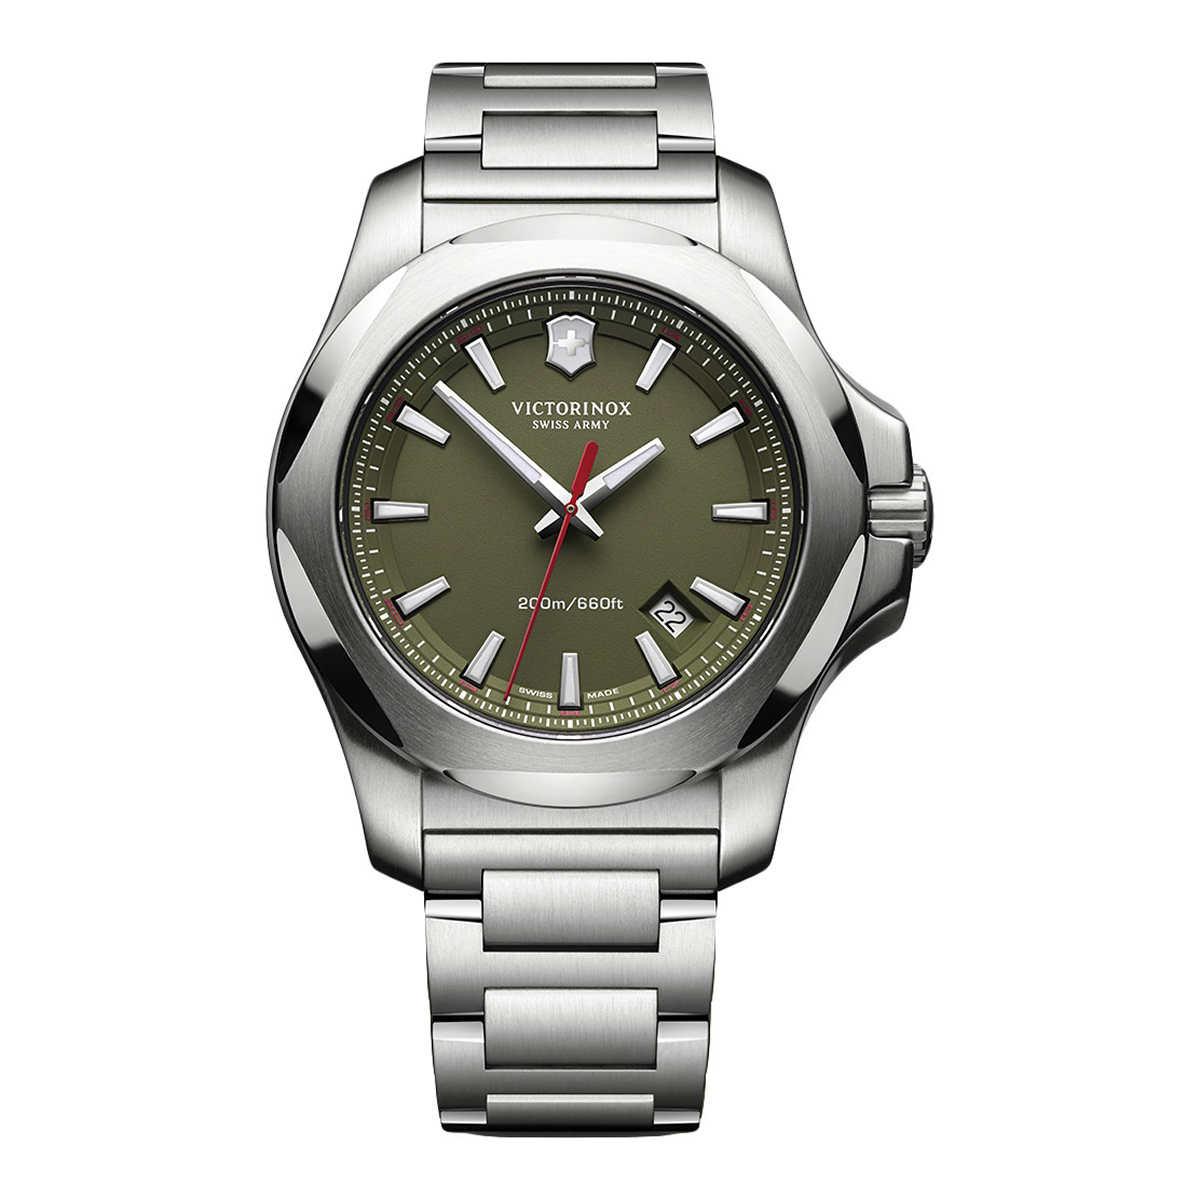 cab8cf6d44cbe ... Victorinox Swiss Army INOX Green Dial Men's Watch. 1 1. Click to Zoom